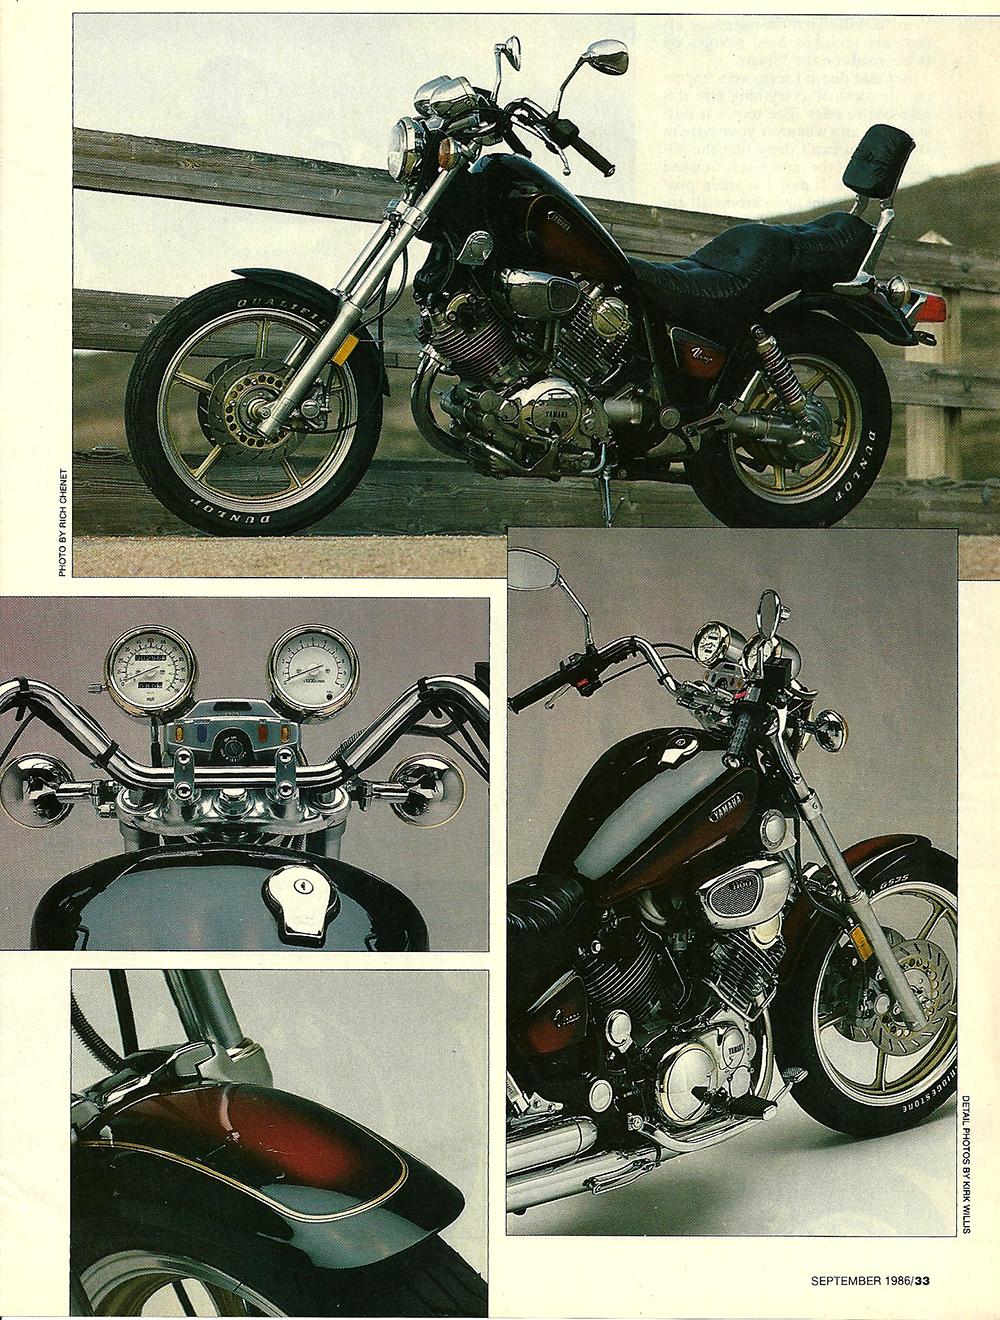 1986 Yamaha Virago 1100 road test 02.jpg